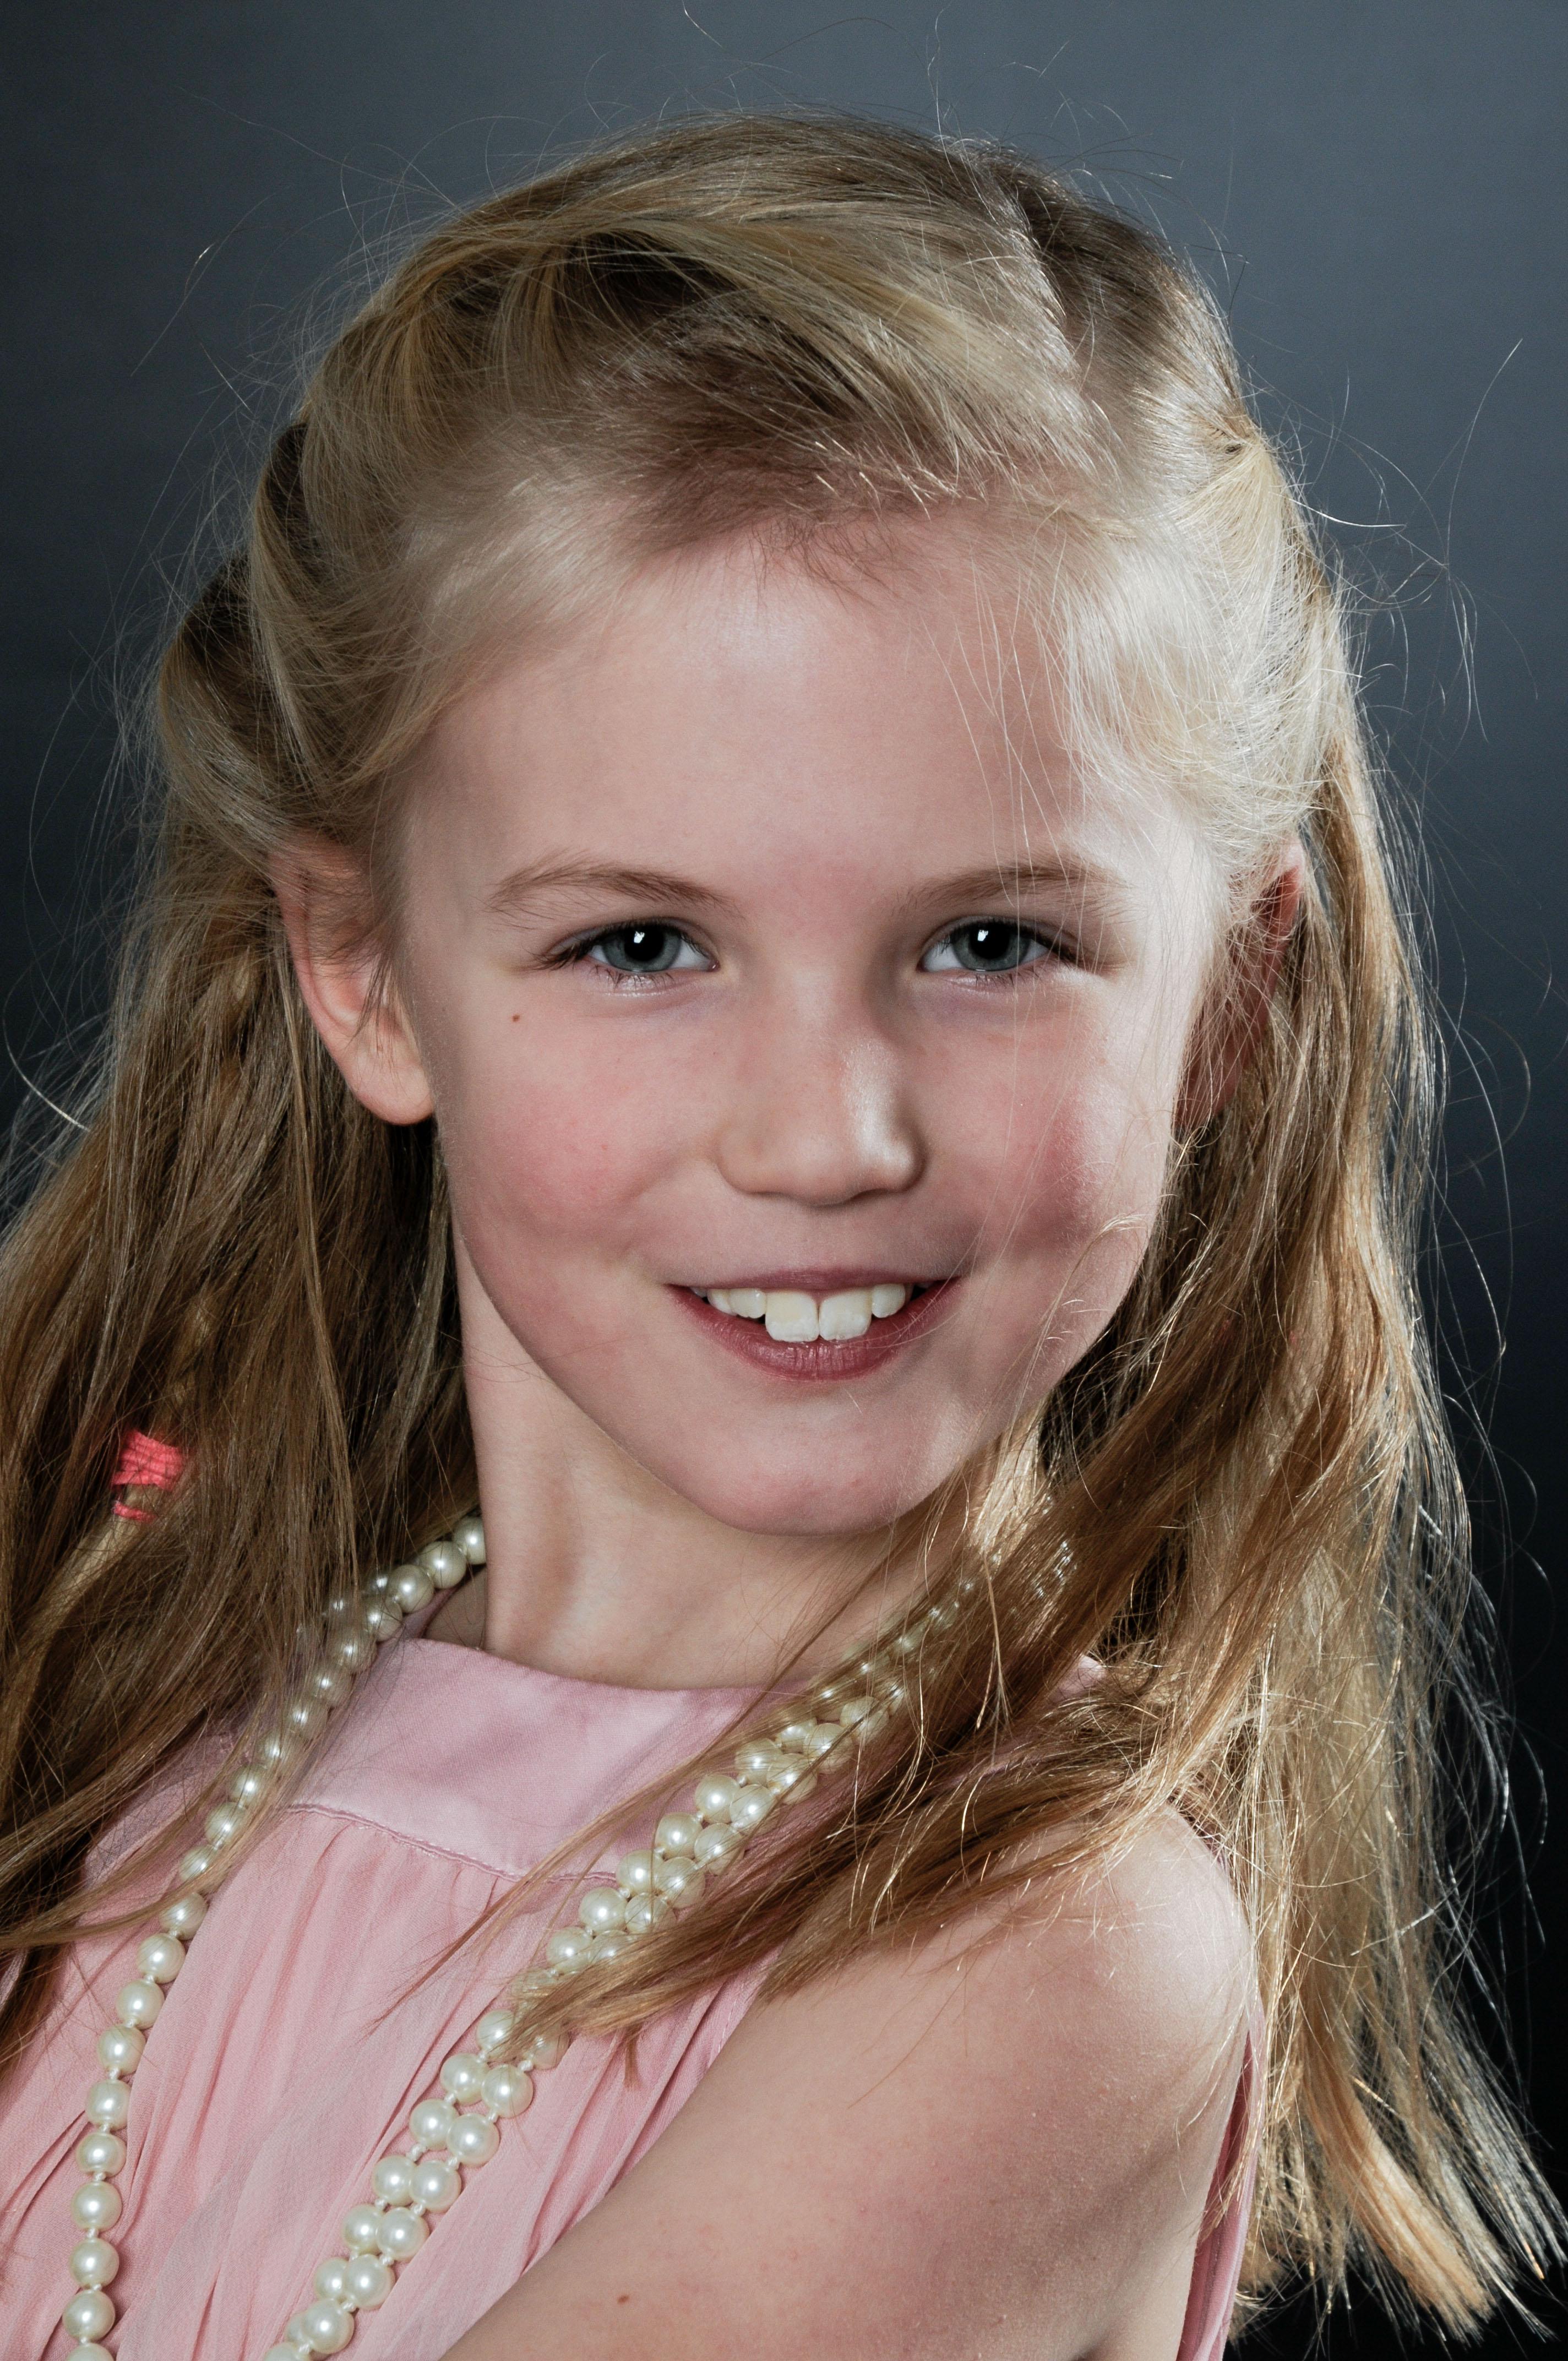 Kinderfotografie_Nadine Grenningloh011